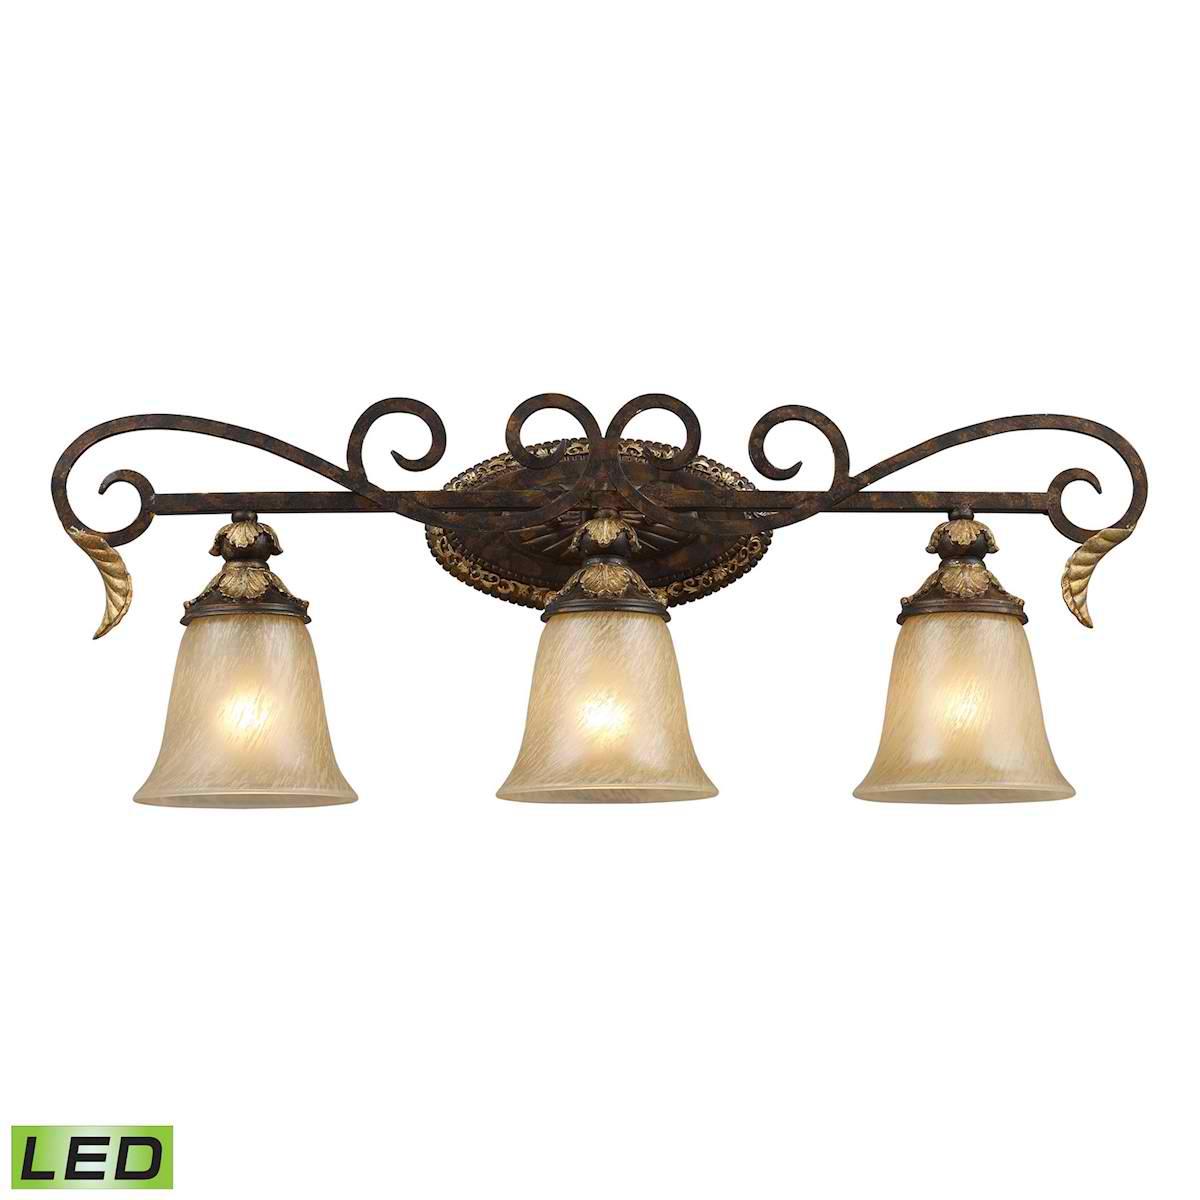 3 Light Vanity Bar in Burnt Bronze - LED, 800 Lumens (2400 Lumens Total) with Full Scale Dimming Range